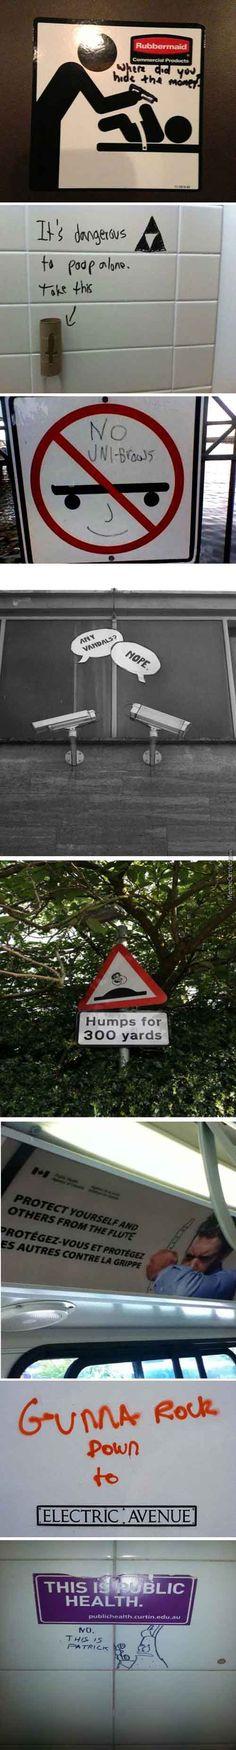 Some Random Acts Of Vandalism